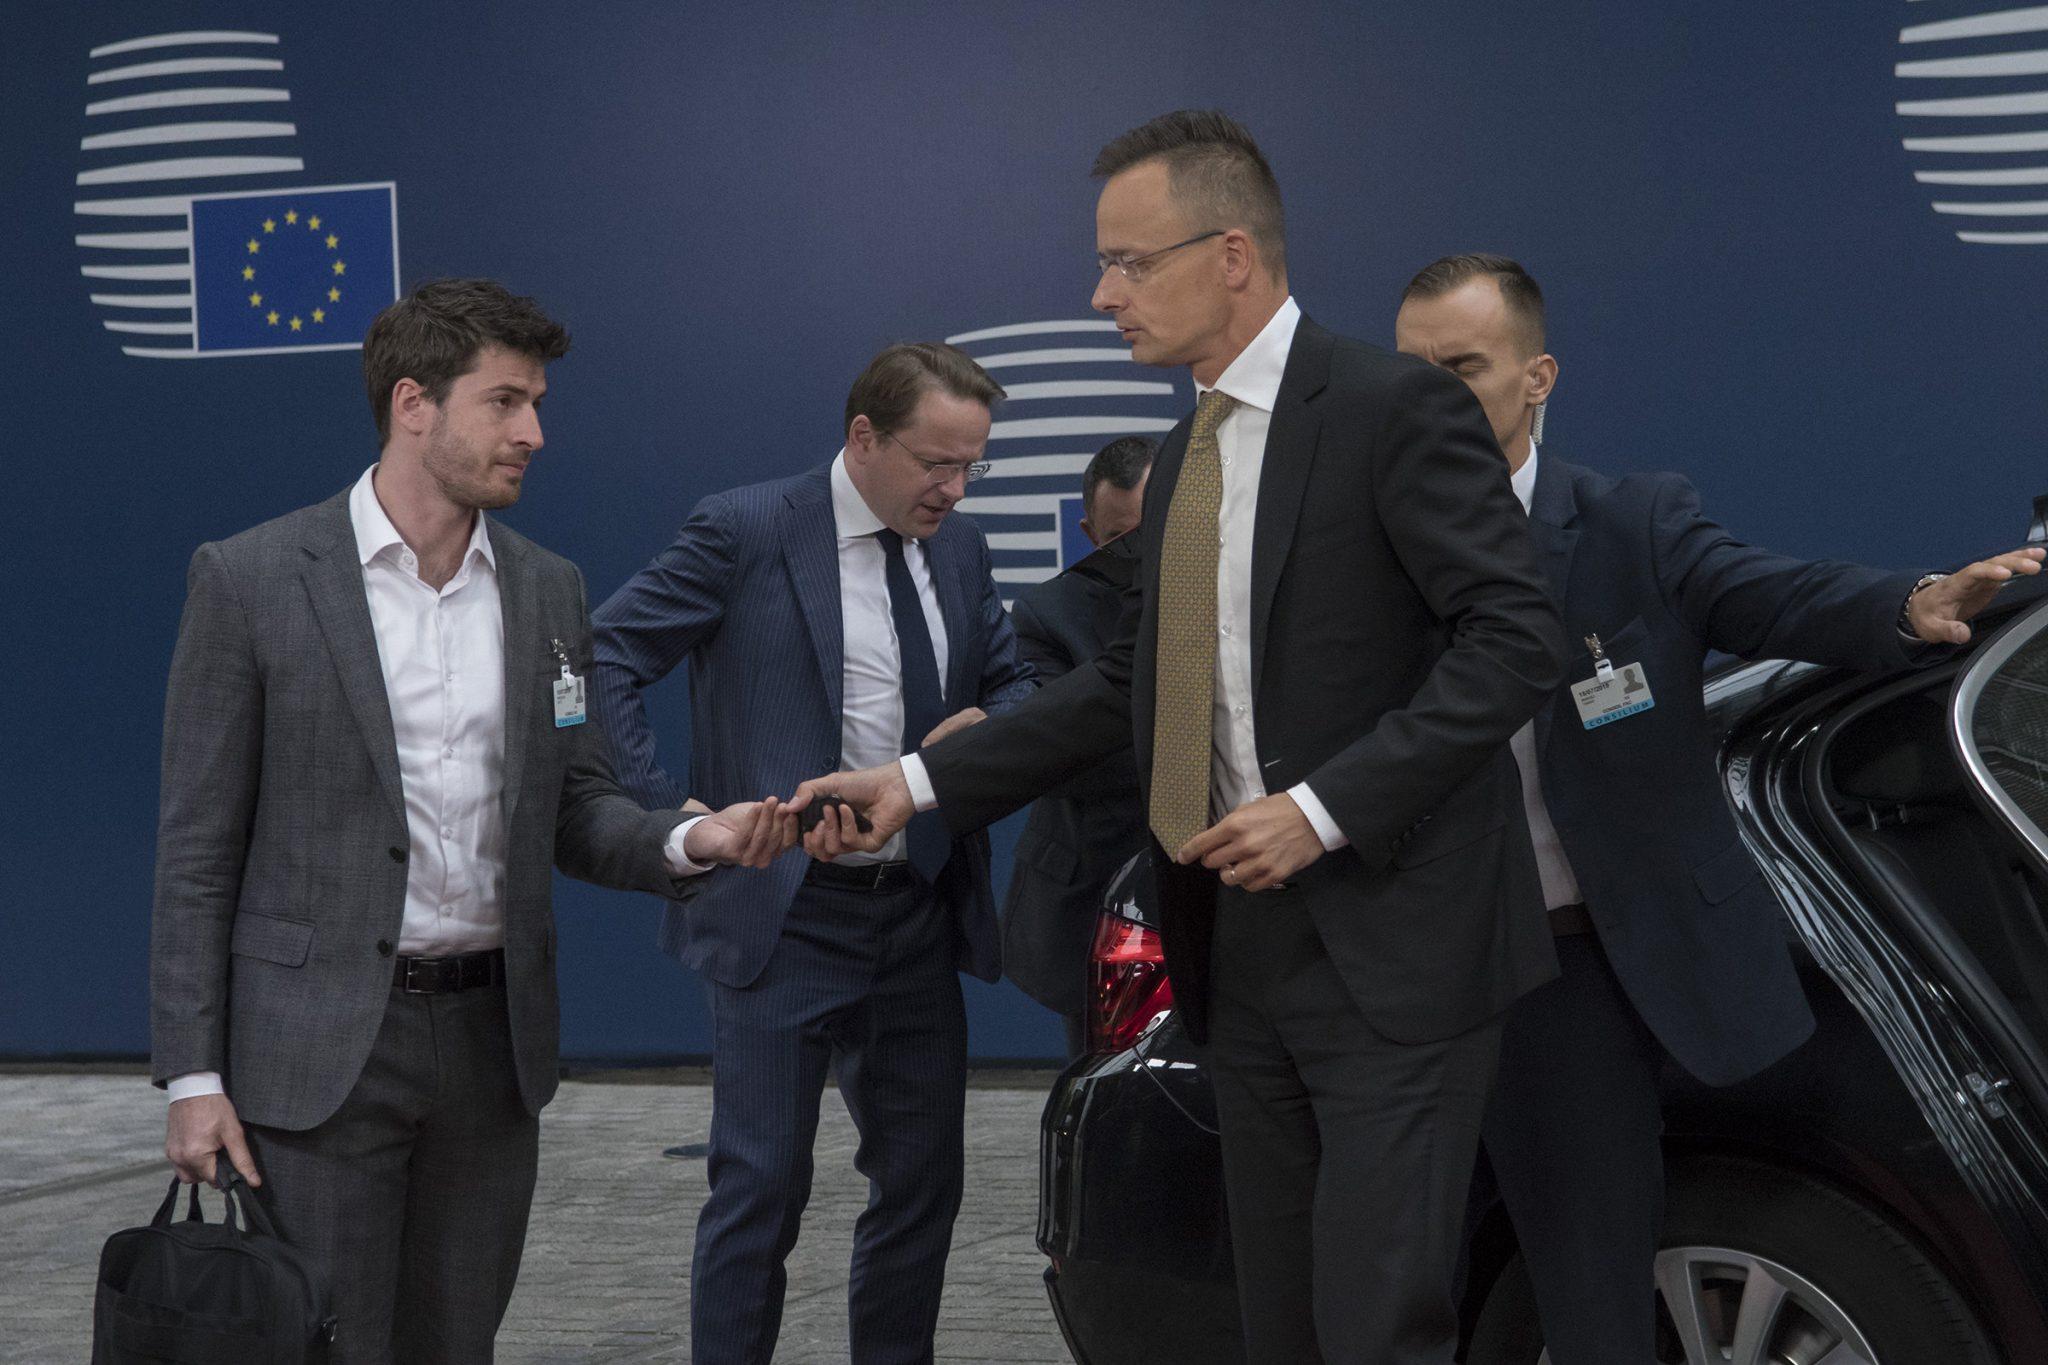 Szijjártó: EU Enlargement 'in Good Hands' with Hungarian Várhelyi post's picture